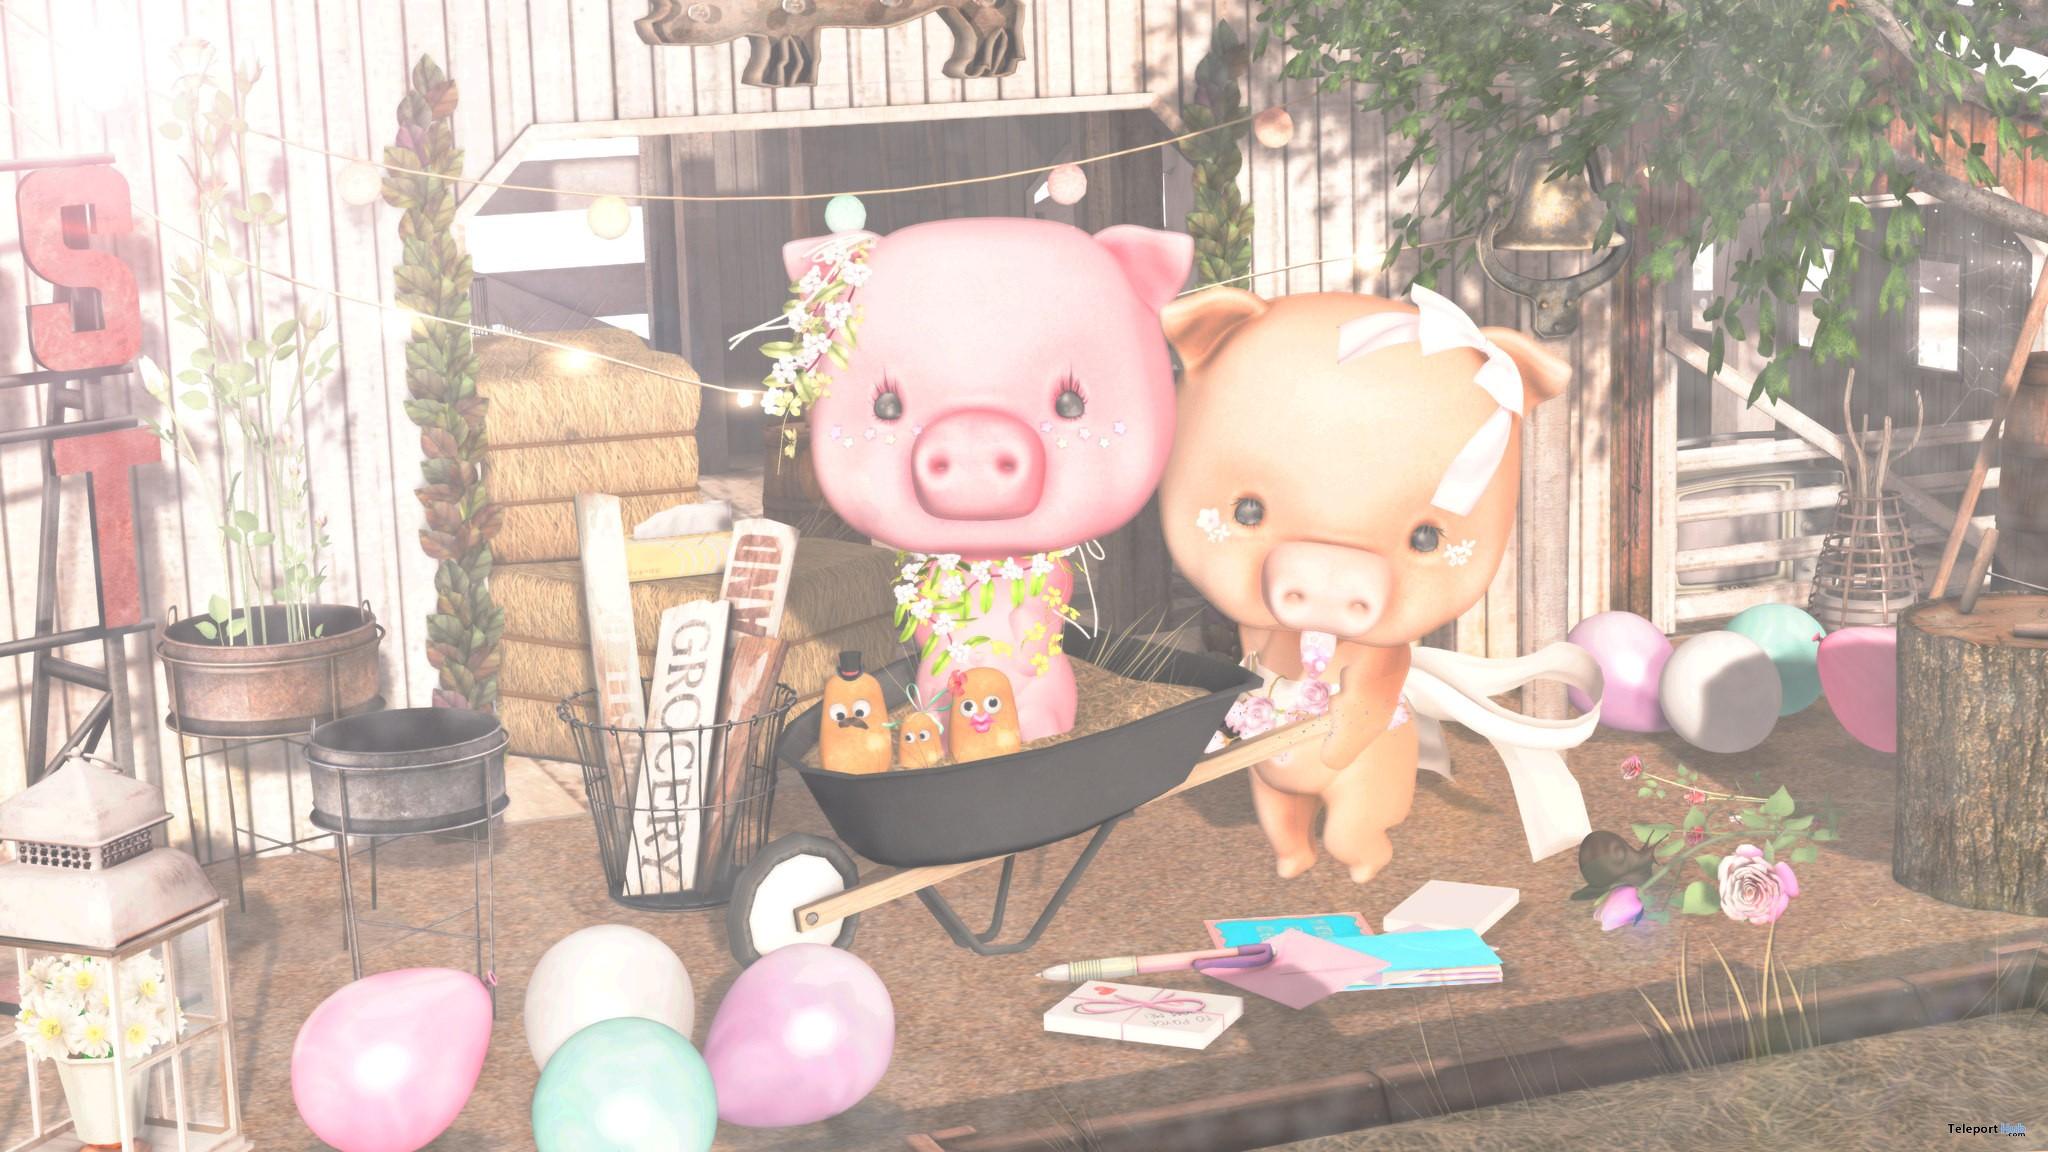 Piggy Avatar Beige & Pink SaNaRae Event September 2017 Group Gift by NiU - Teleport Hub - teleporthub.com